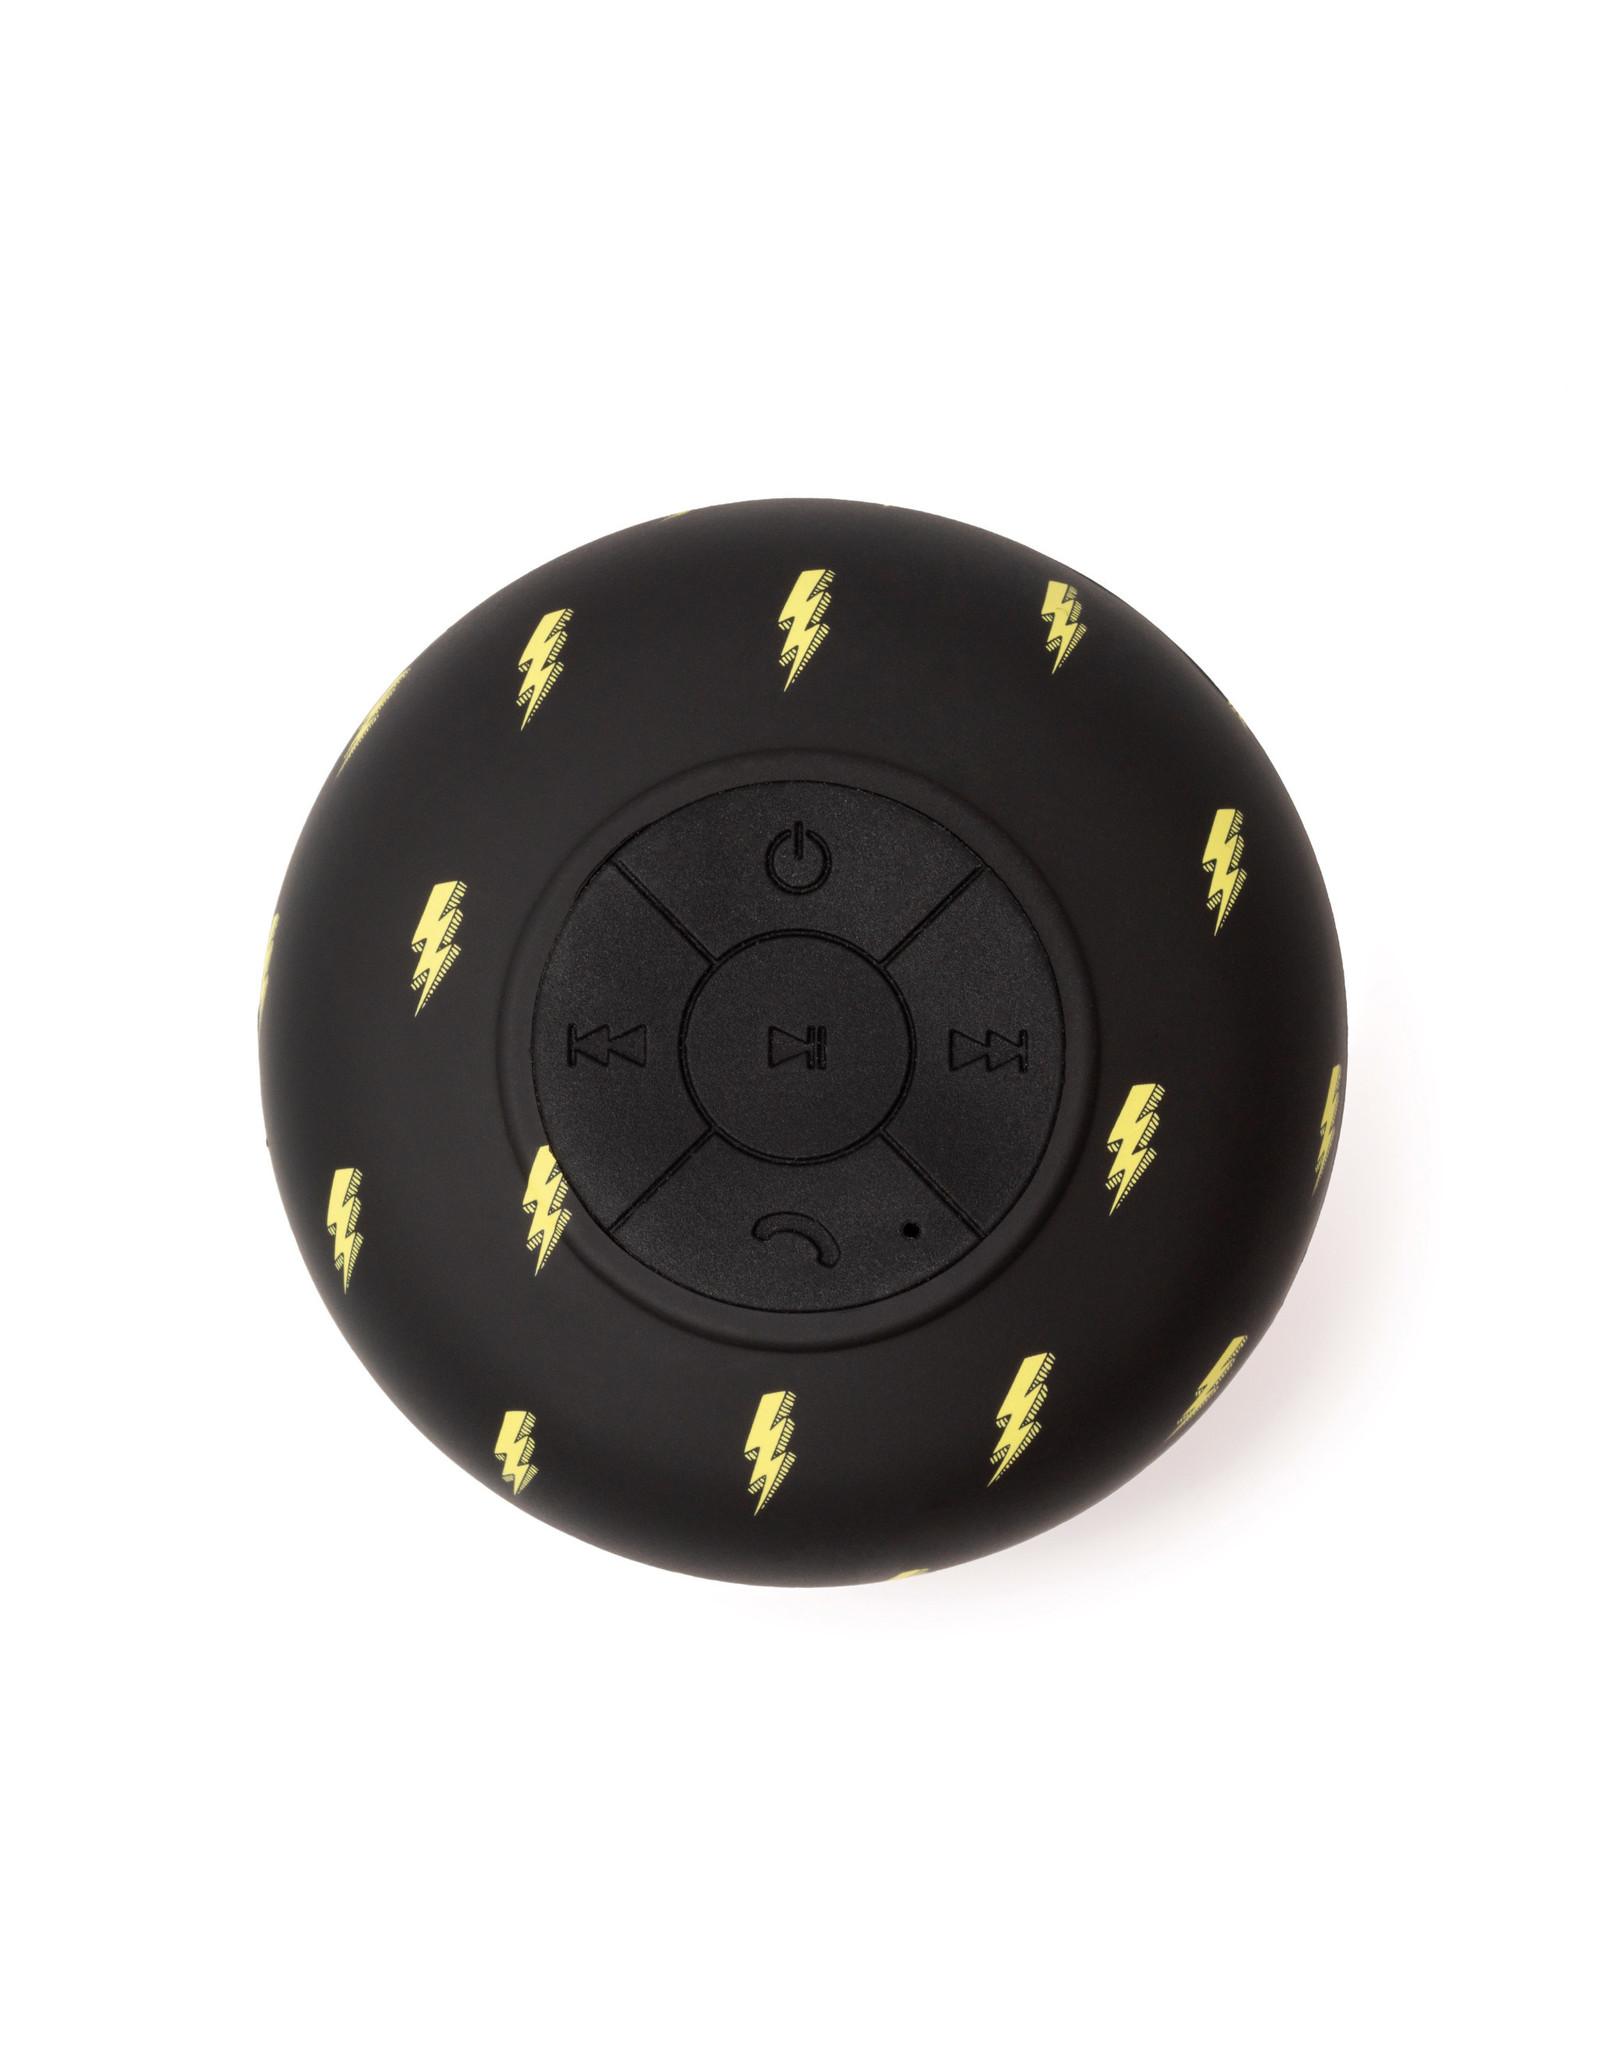 Legami shower speaker - flash